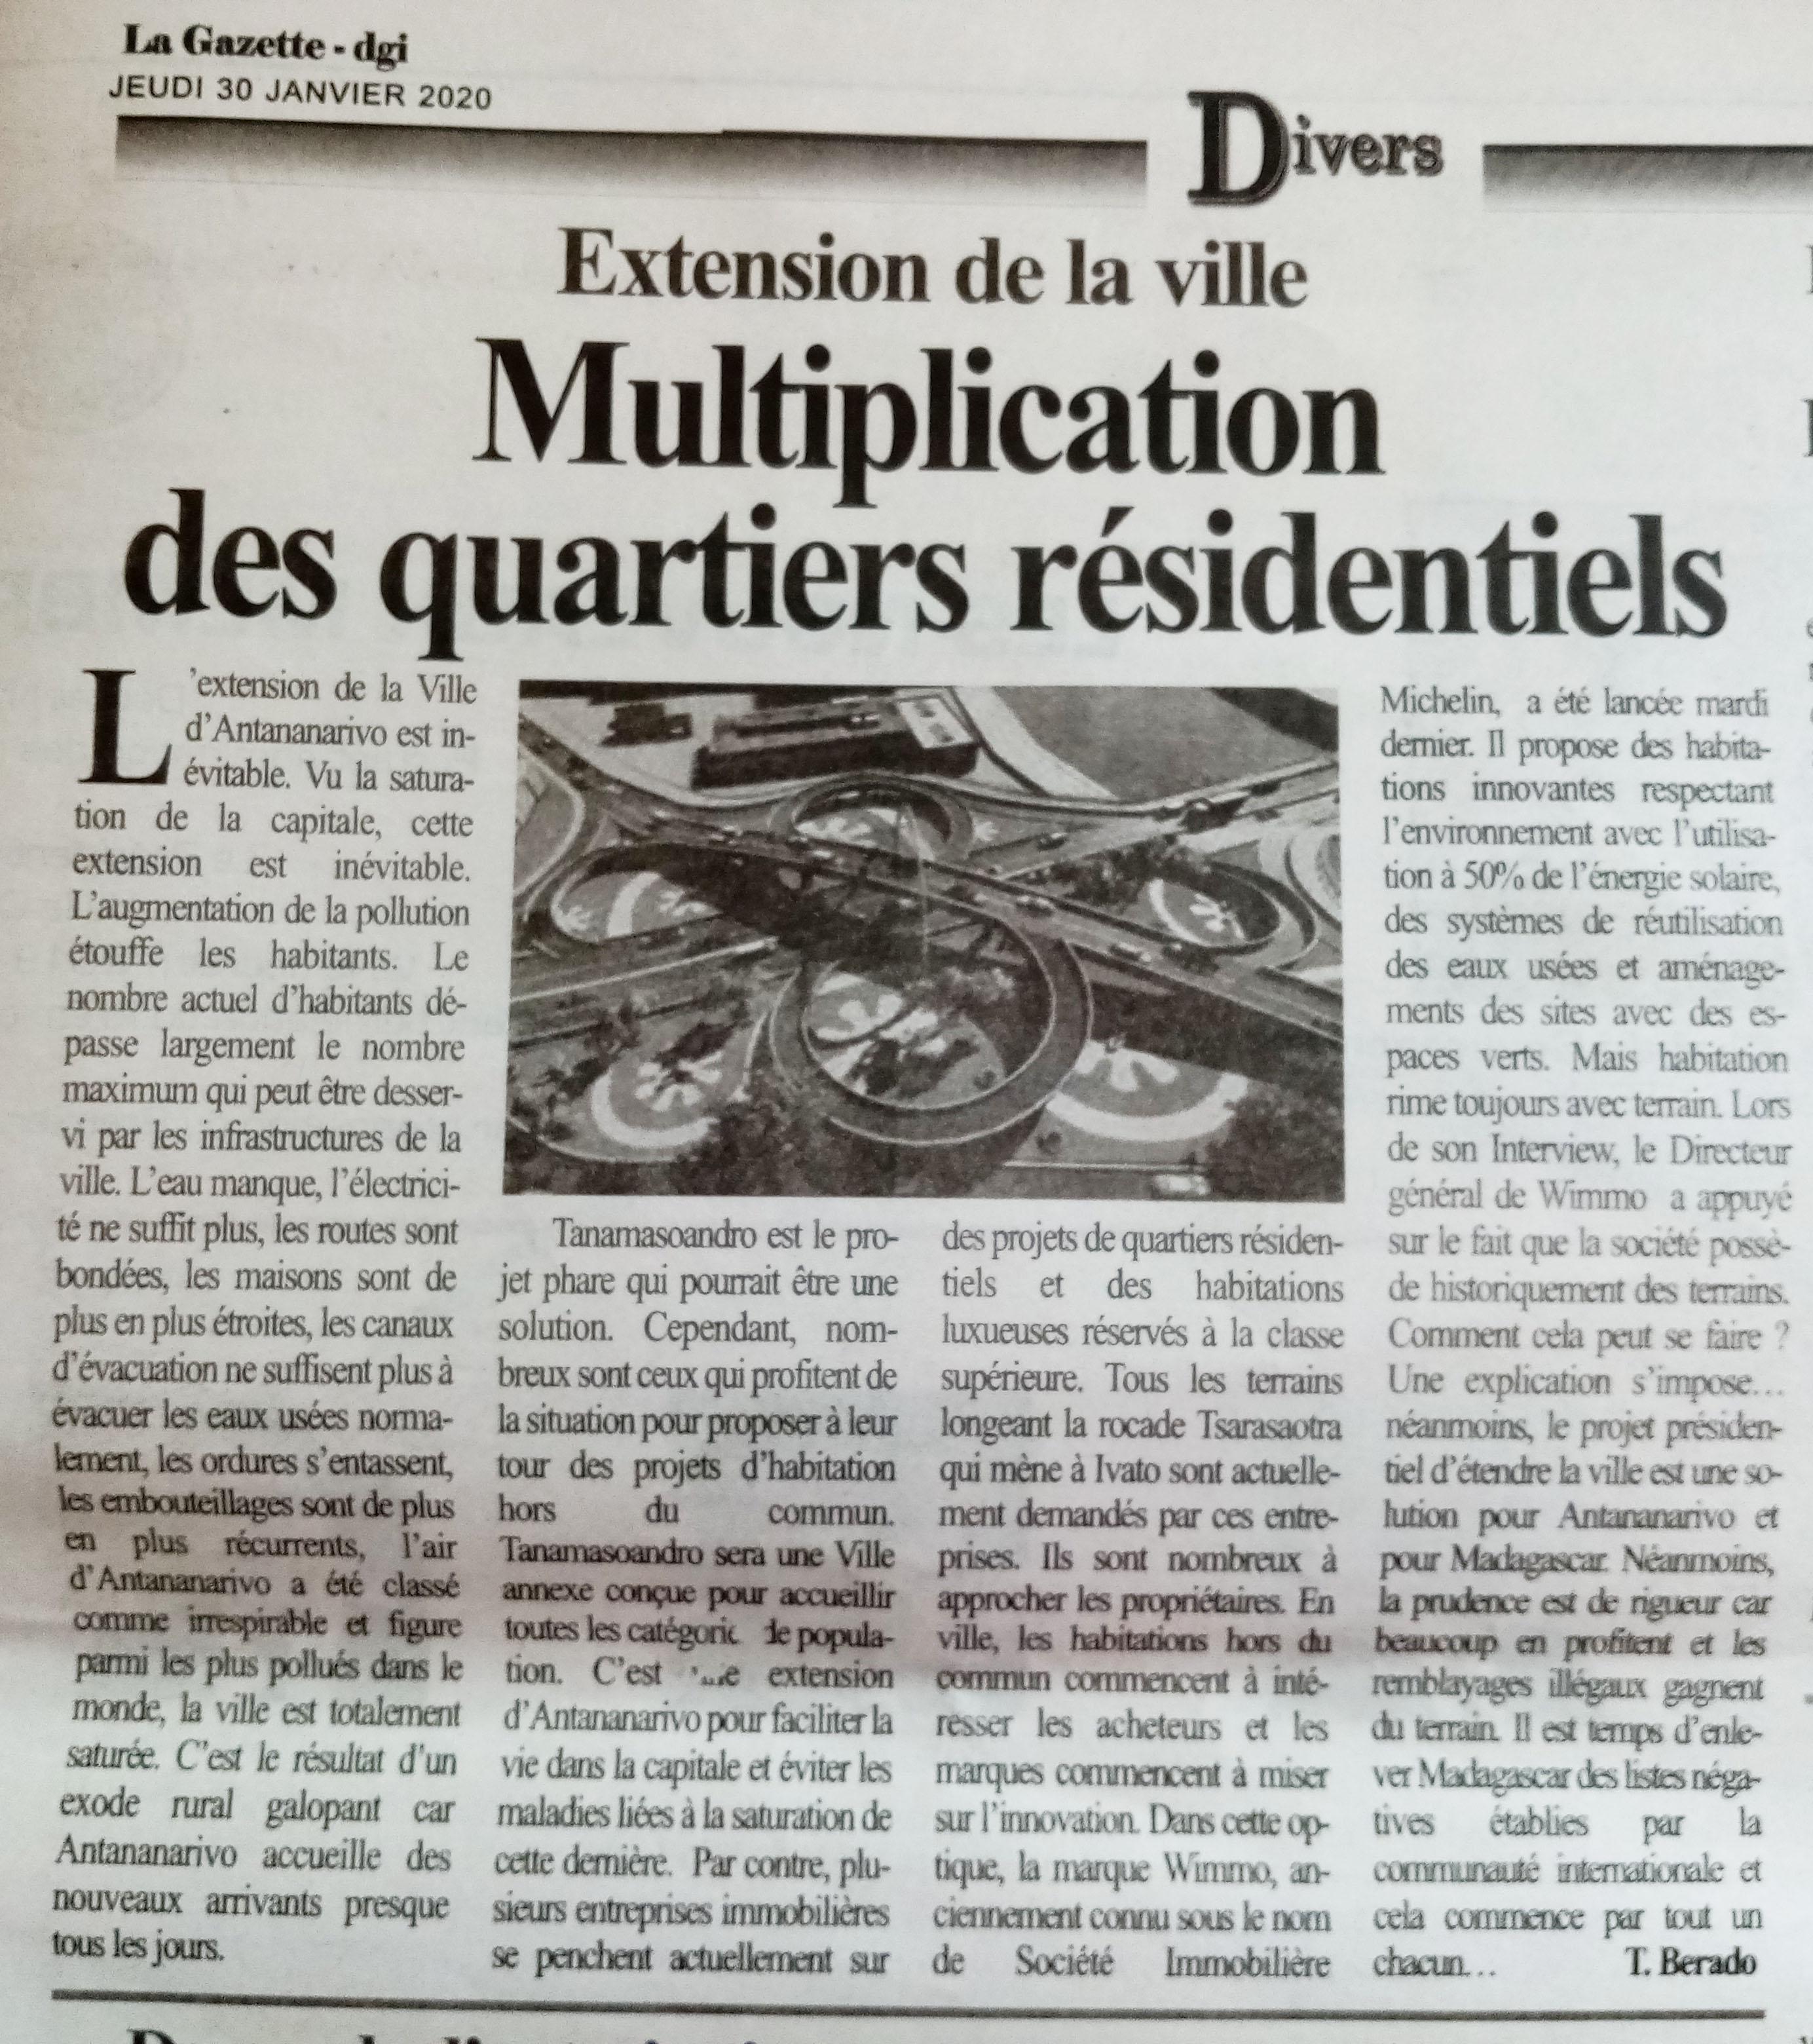 Wimmo dans La Gazette